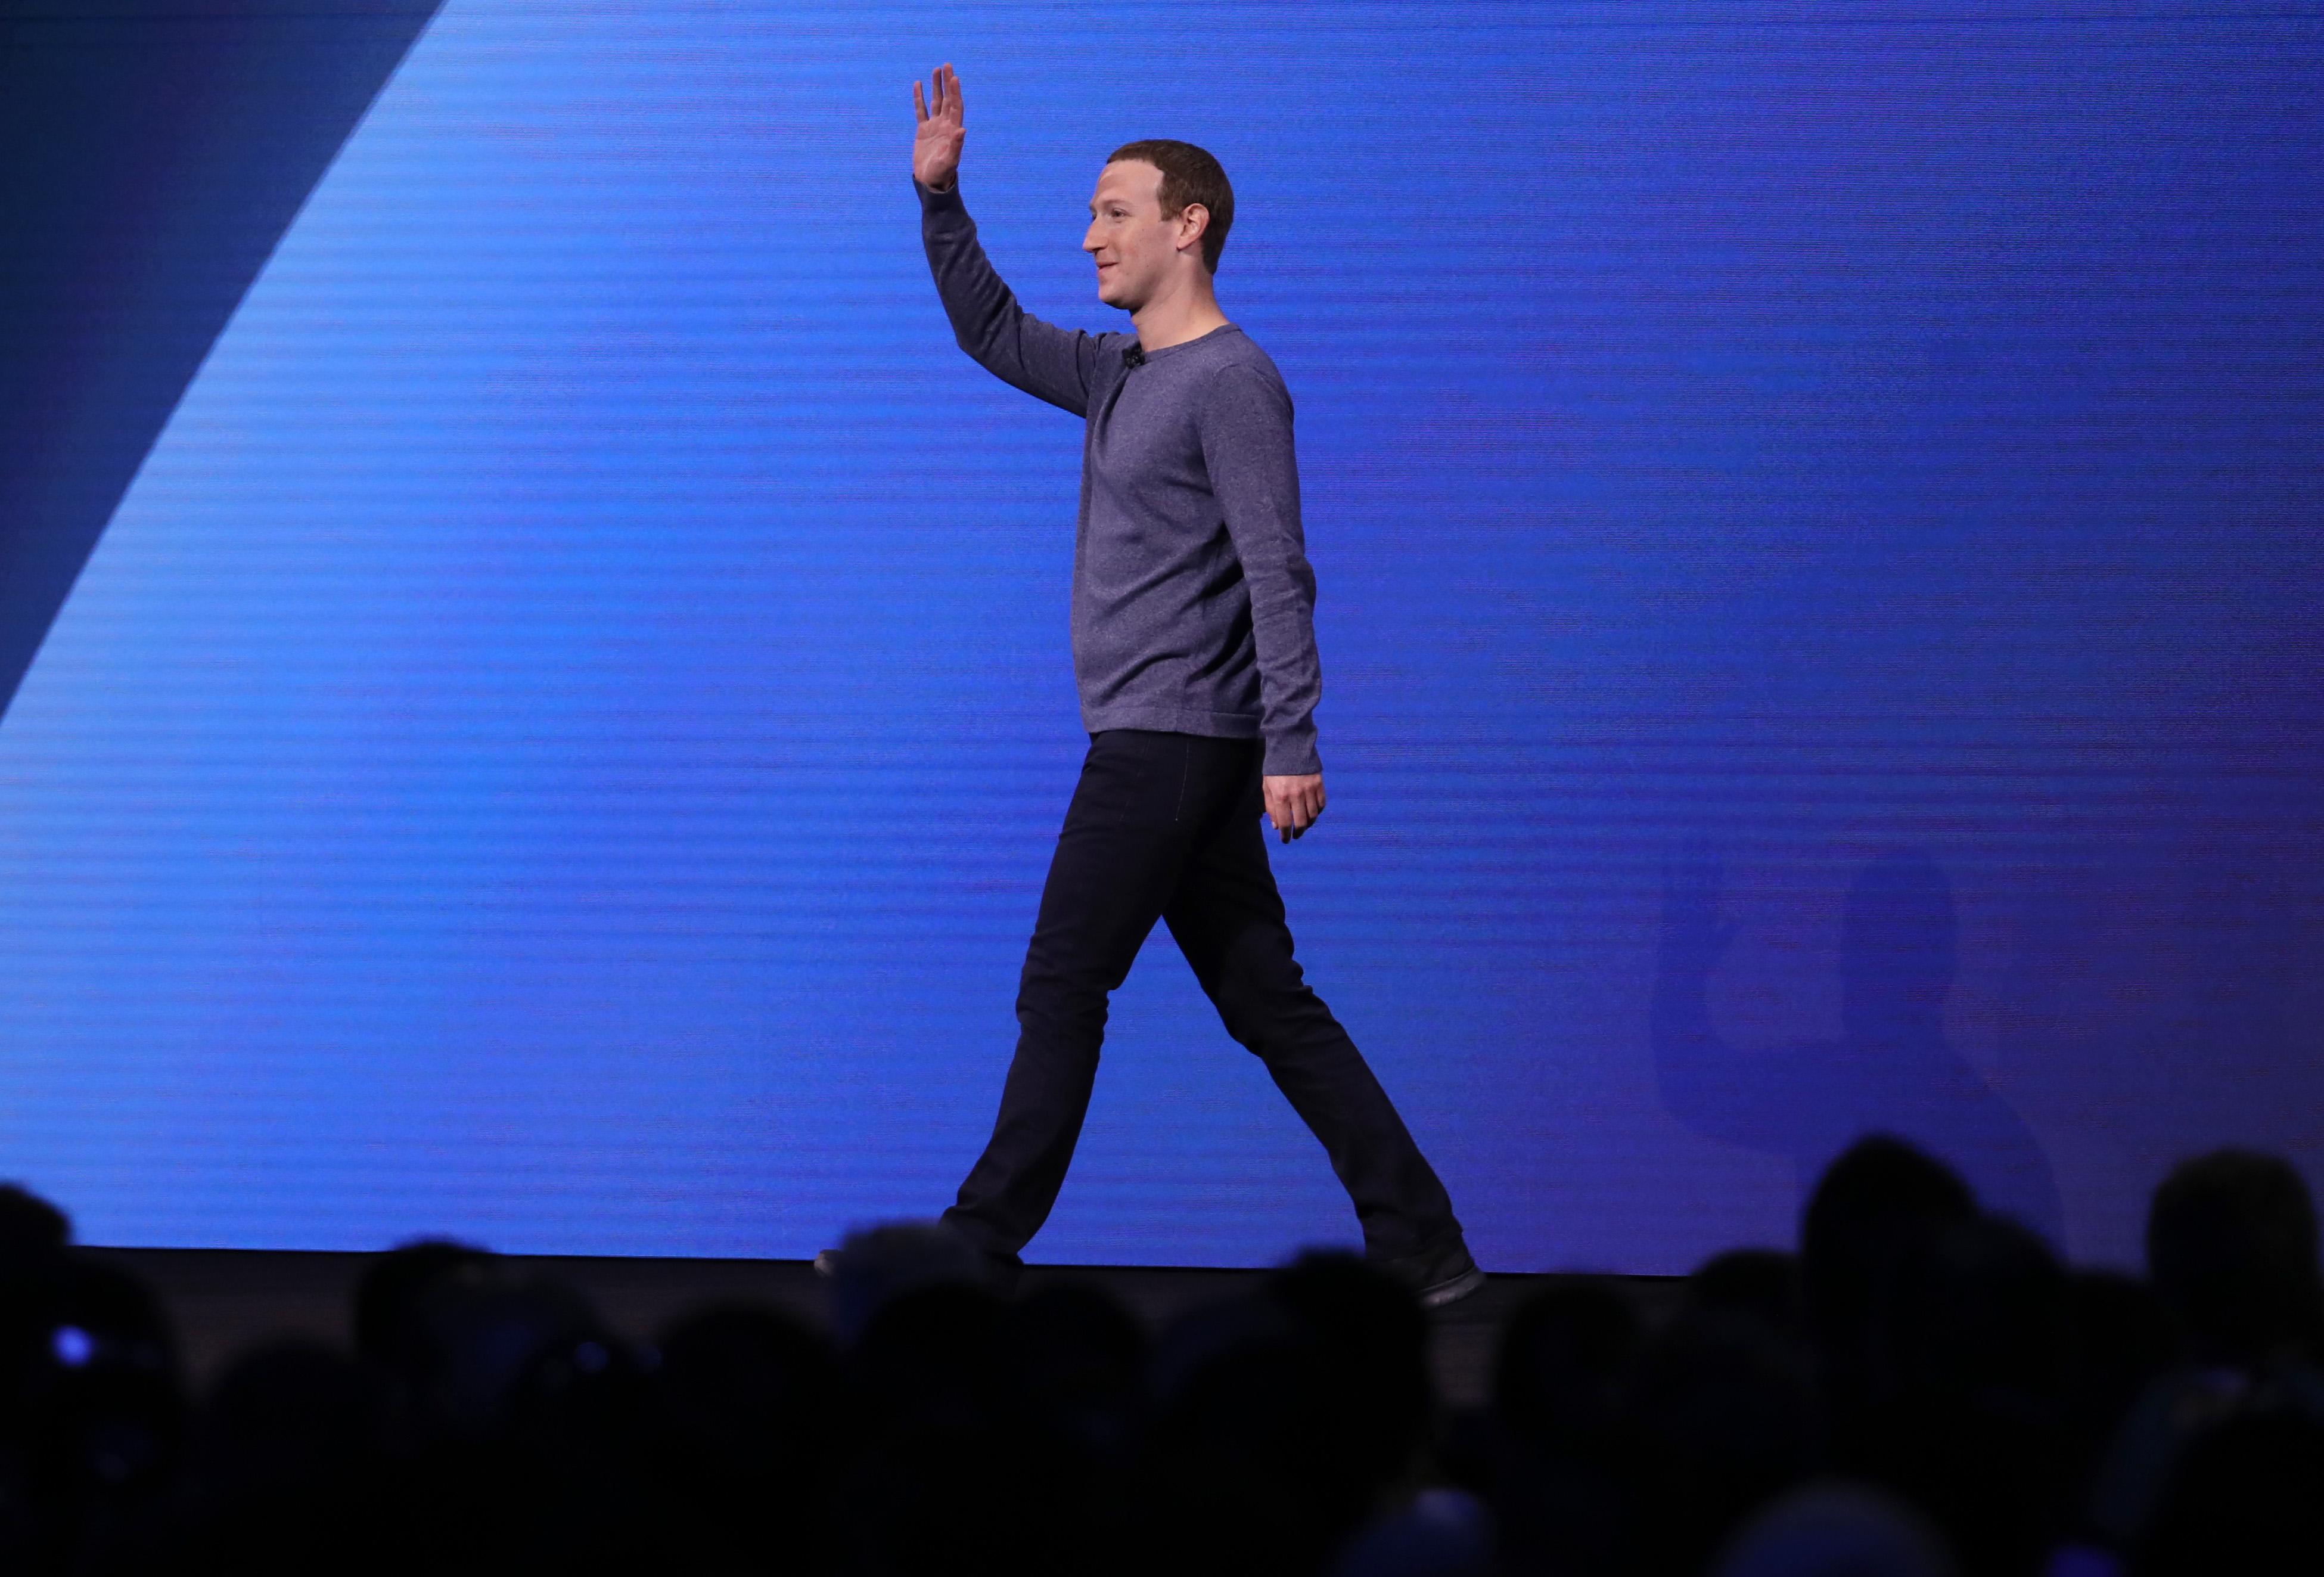 Facebook CEO Mark Zuckerberg walking onstage and waving.